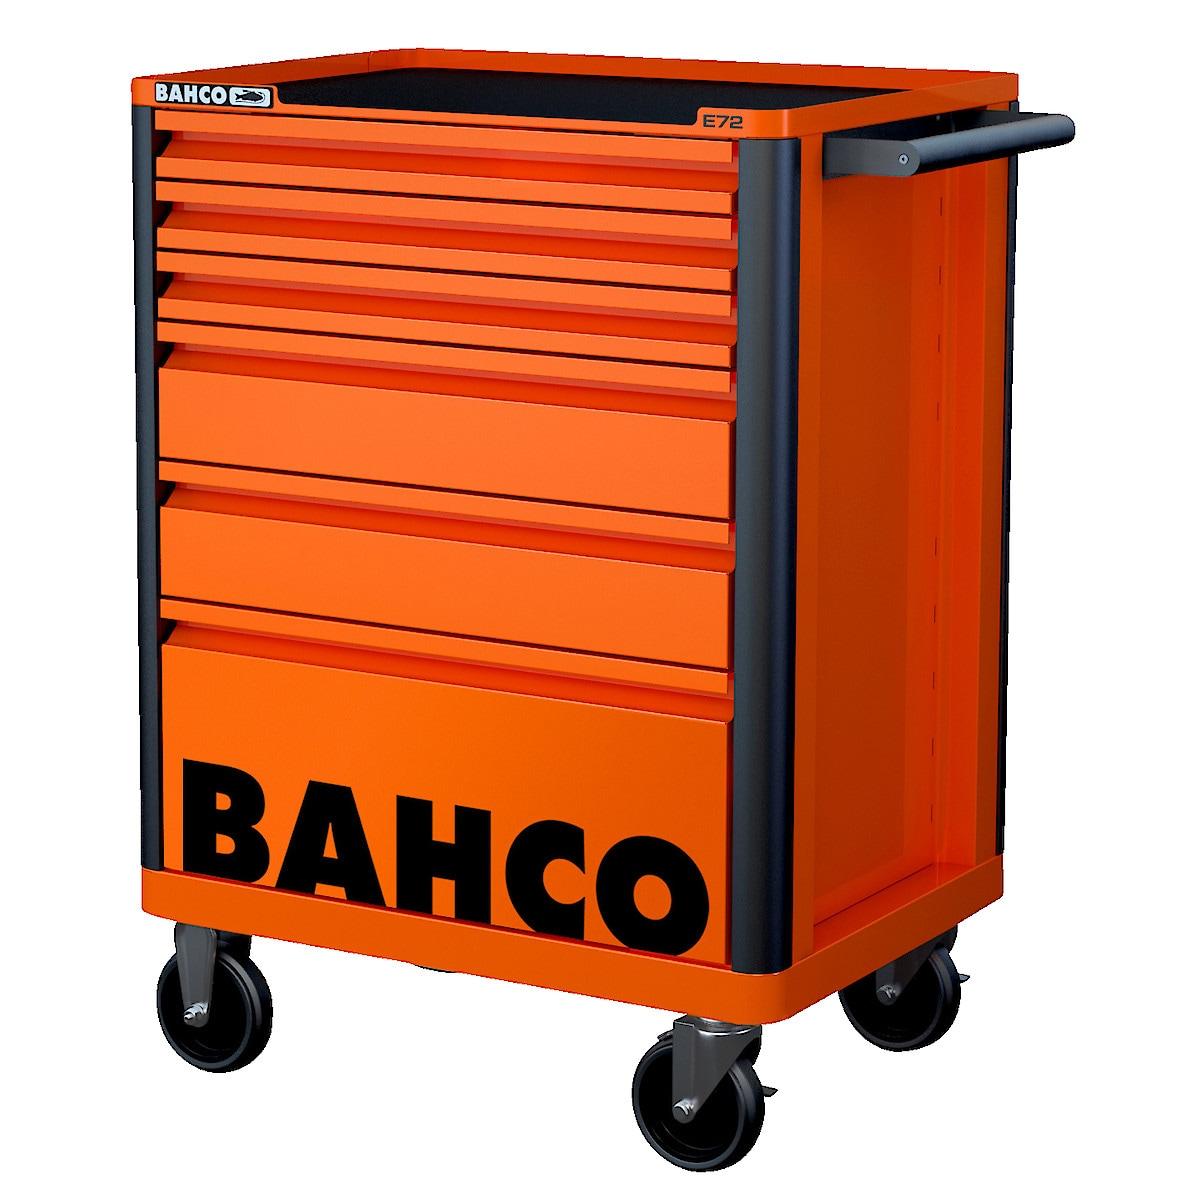 Verktygsskåp Bahco